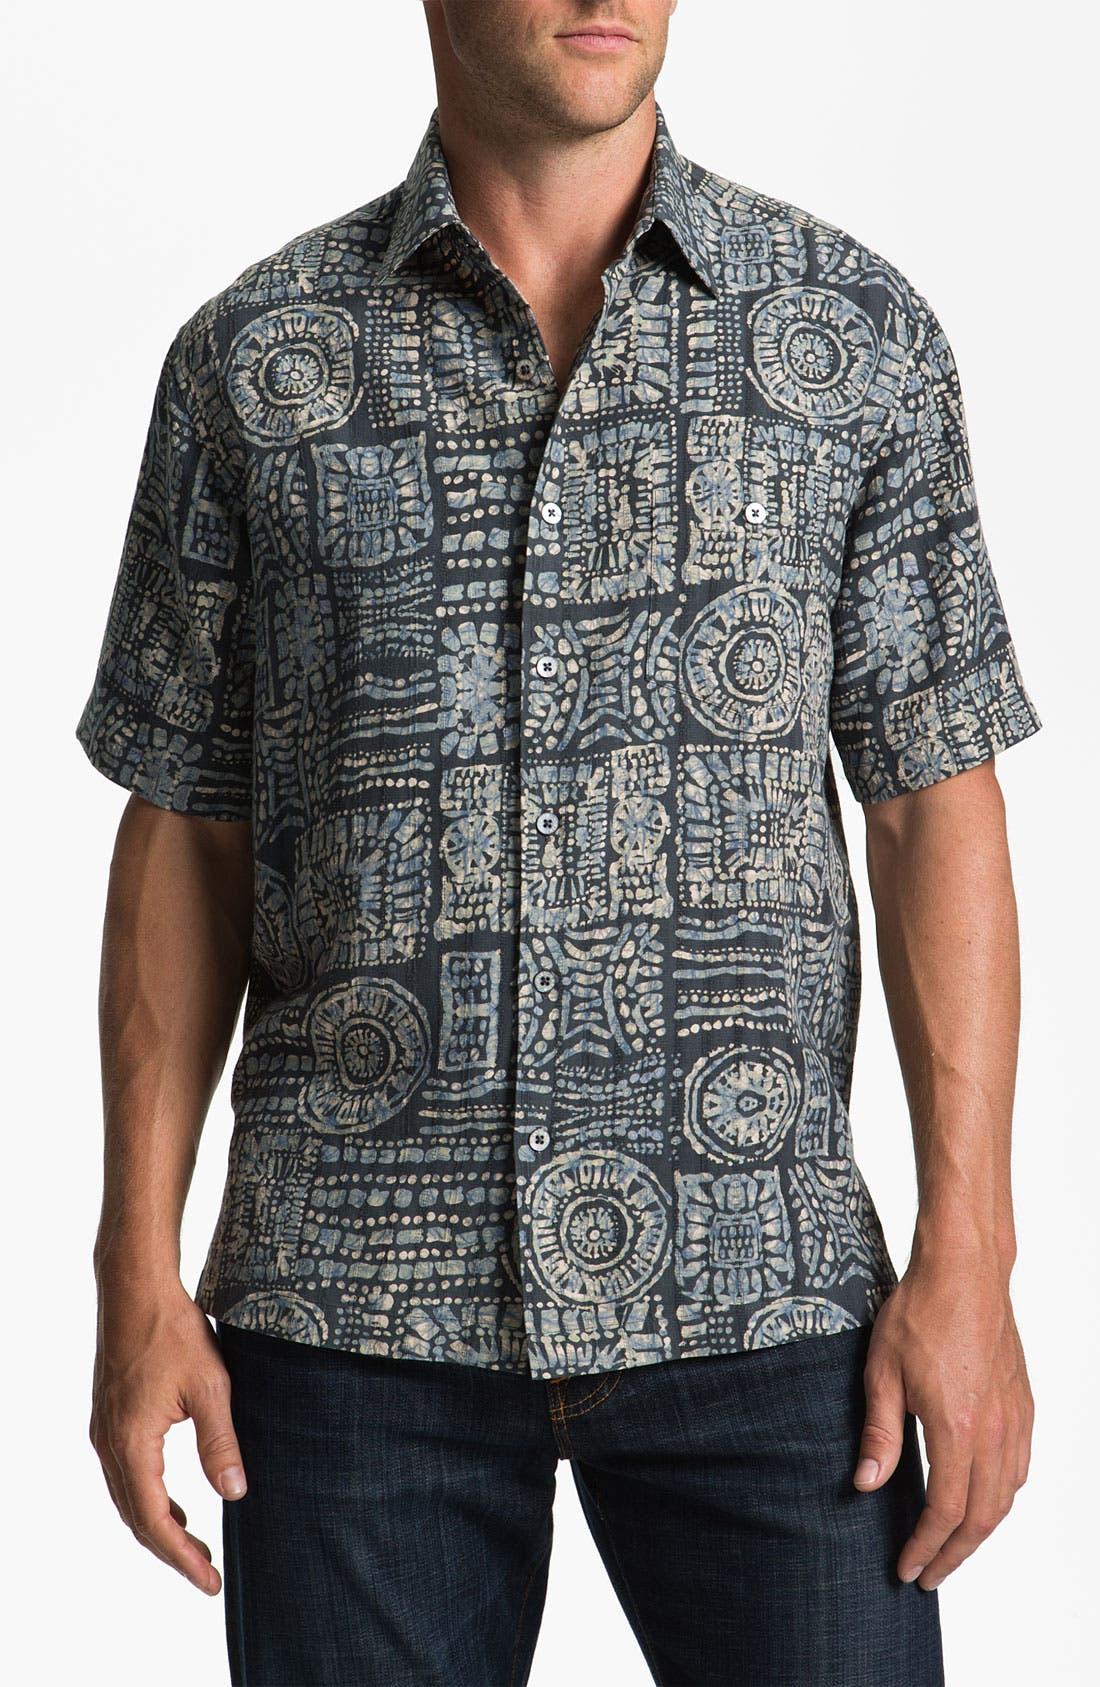 Alternate Image 1 Selected - Tori Richard 'Lost City' Sport Shirt